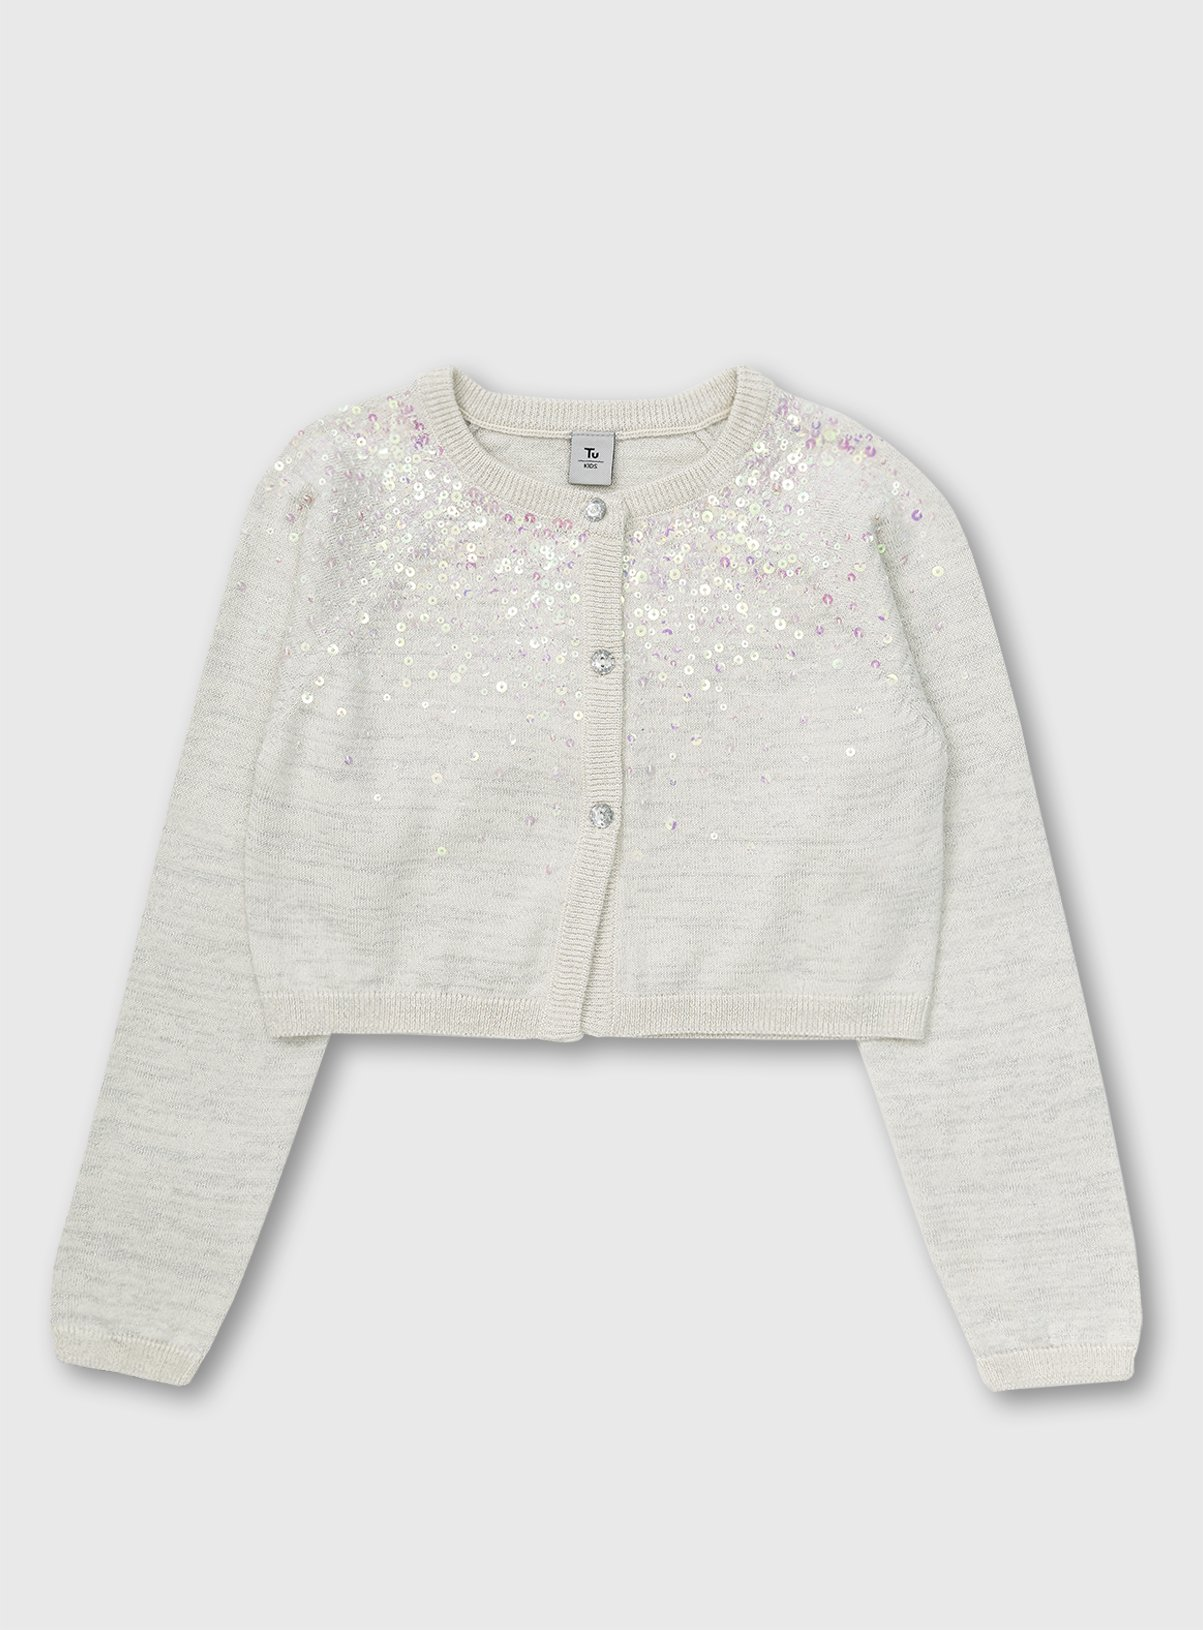 White Glitter Yoke Long Sleeve Bolero - 6 years